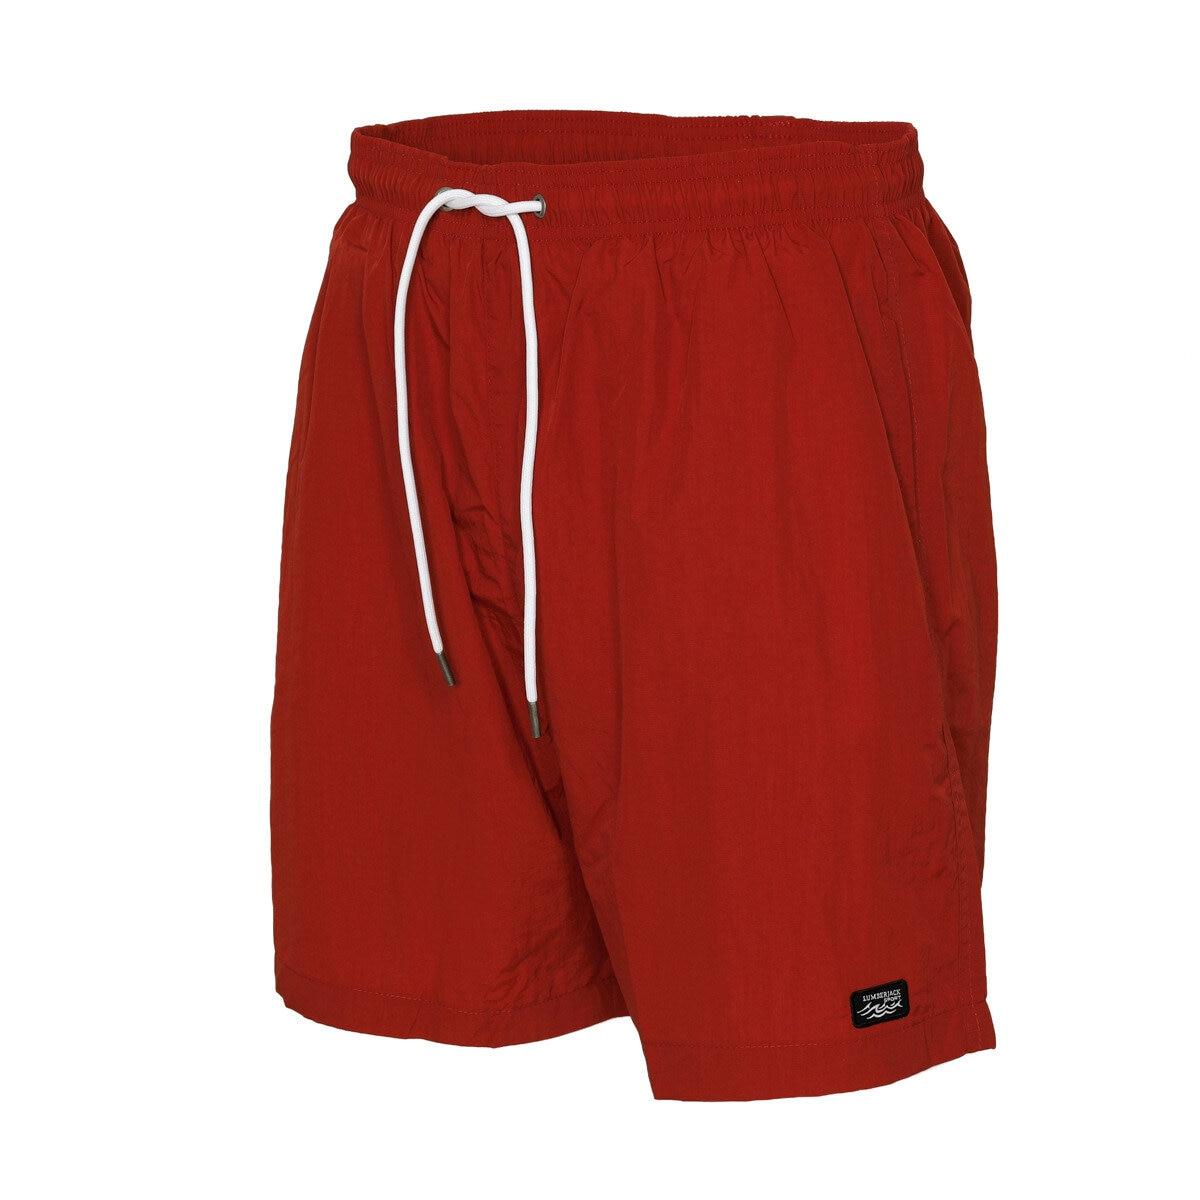 FLO M-1659 BUSY SEA SORTU Red Male Sea Shorts LUMBERJACK